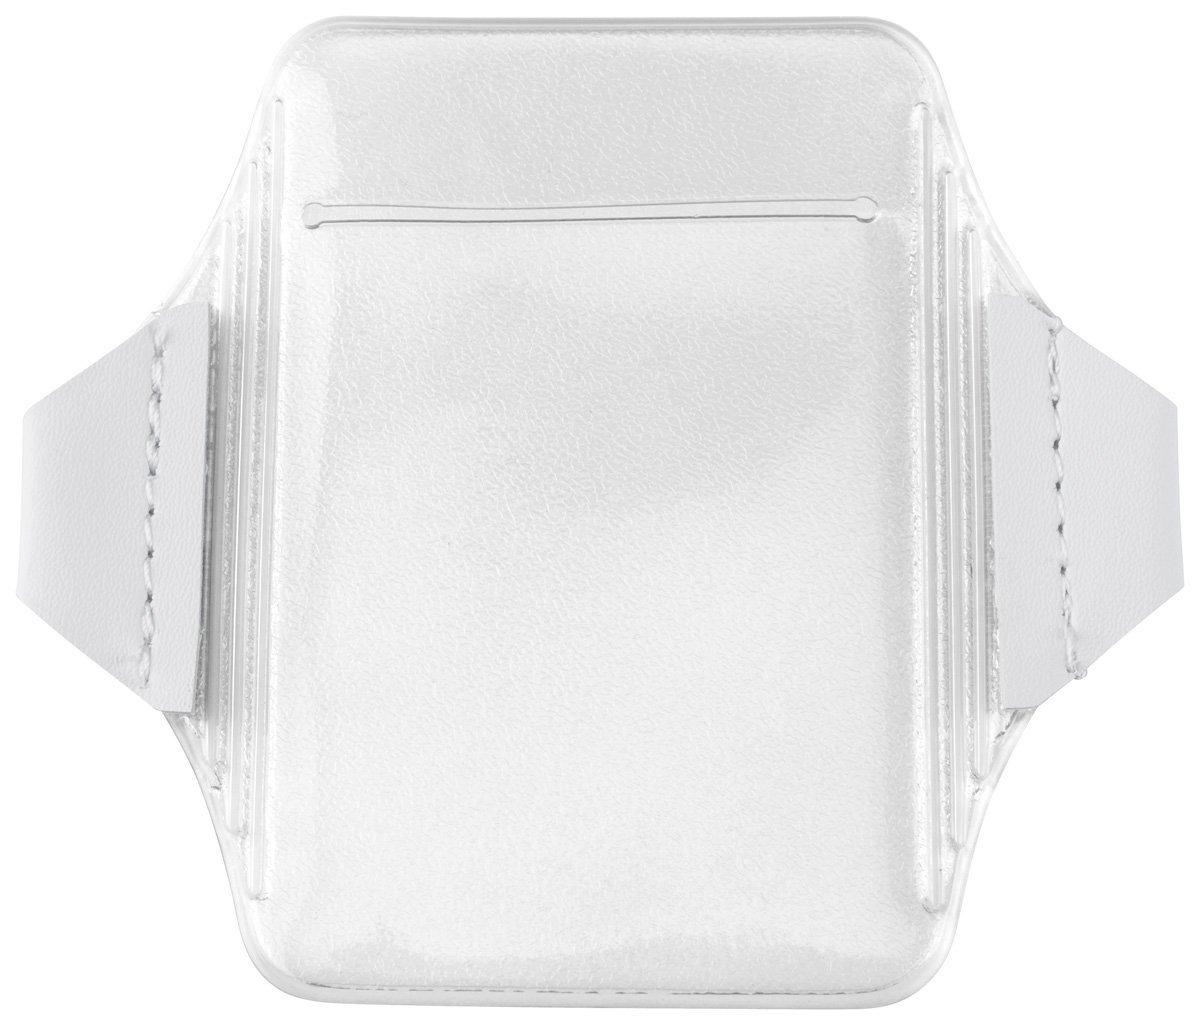 ID armband holder